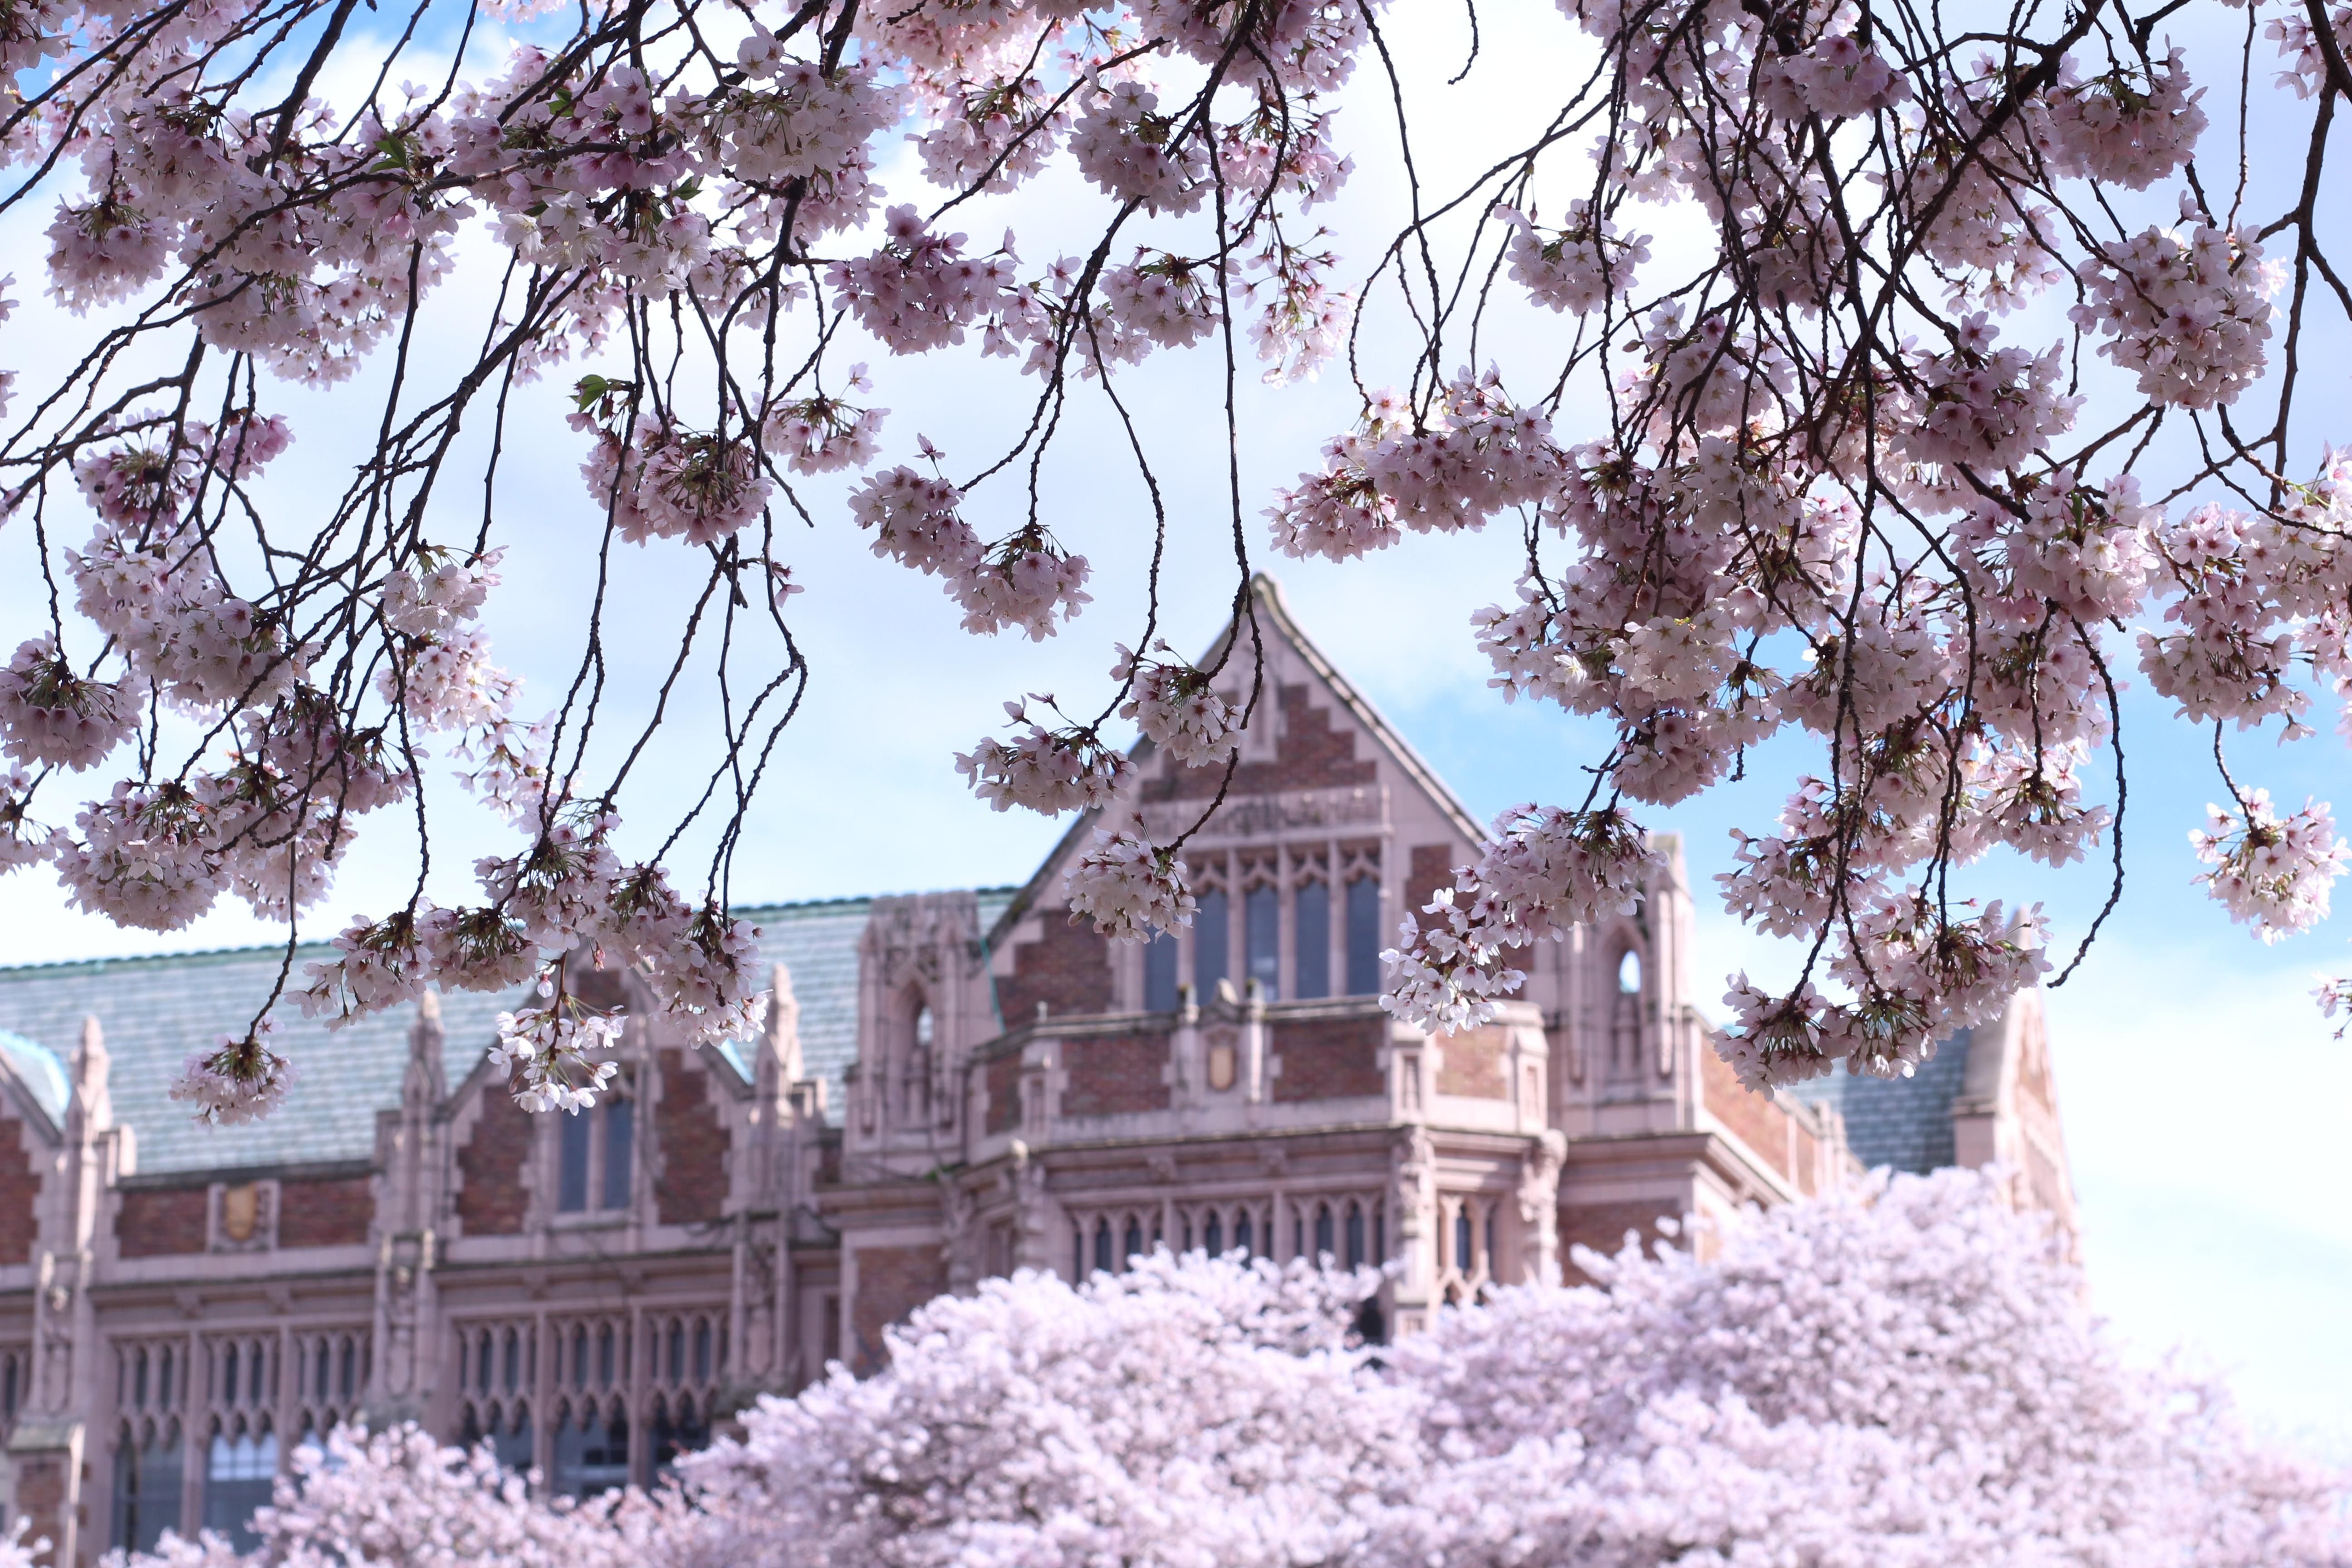 Can I get into the university of washington?